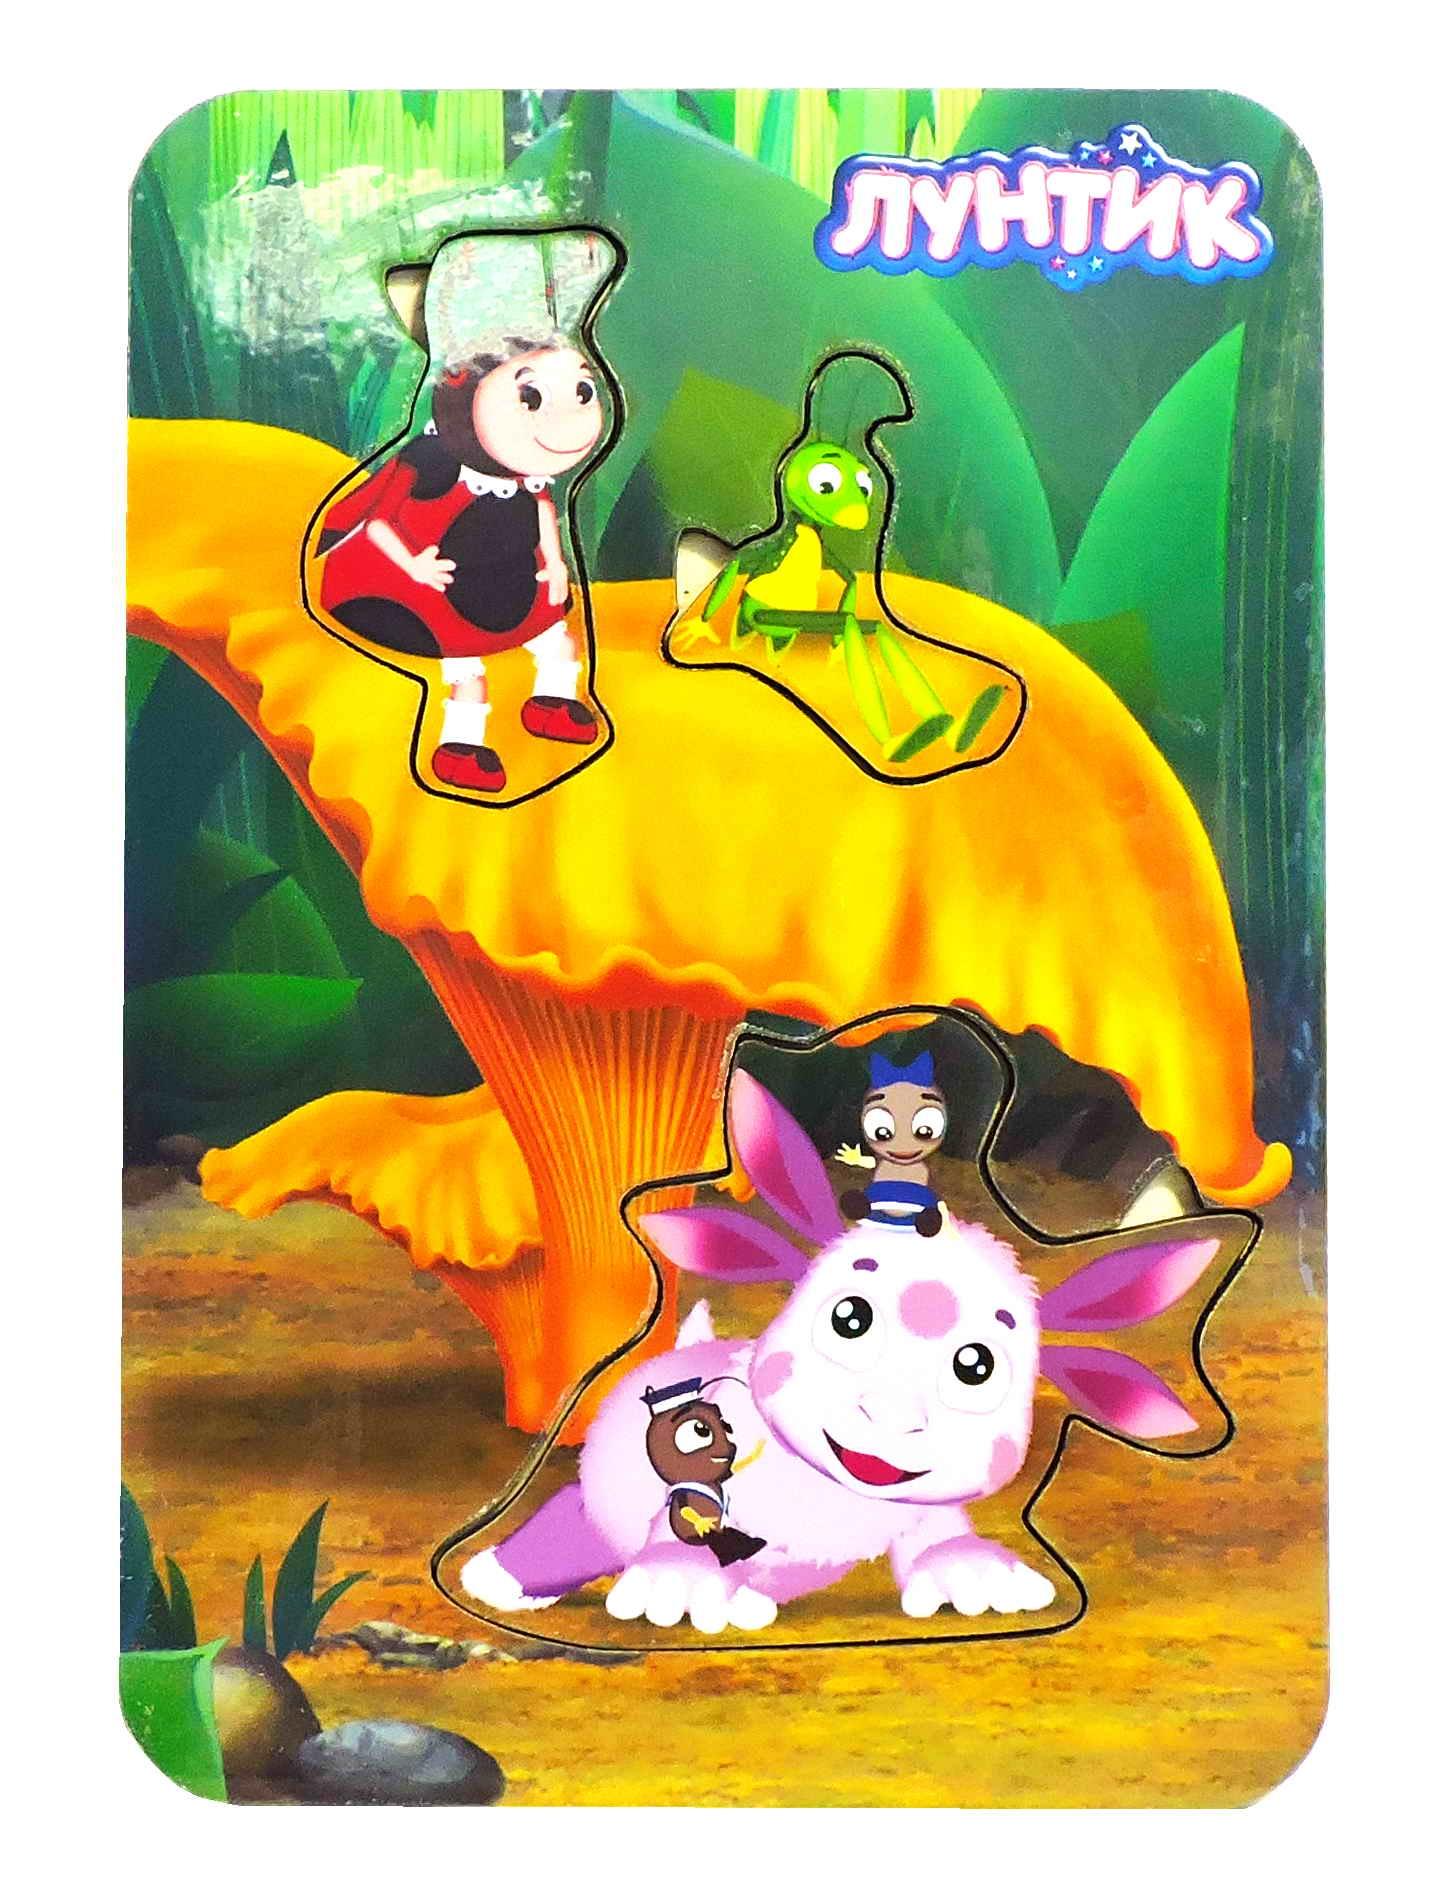 Пазл для малышей Taowa 051-553-1